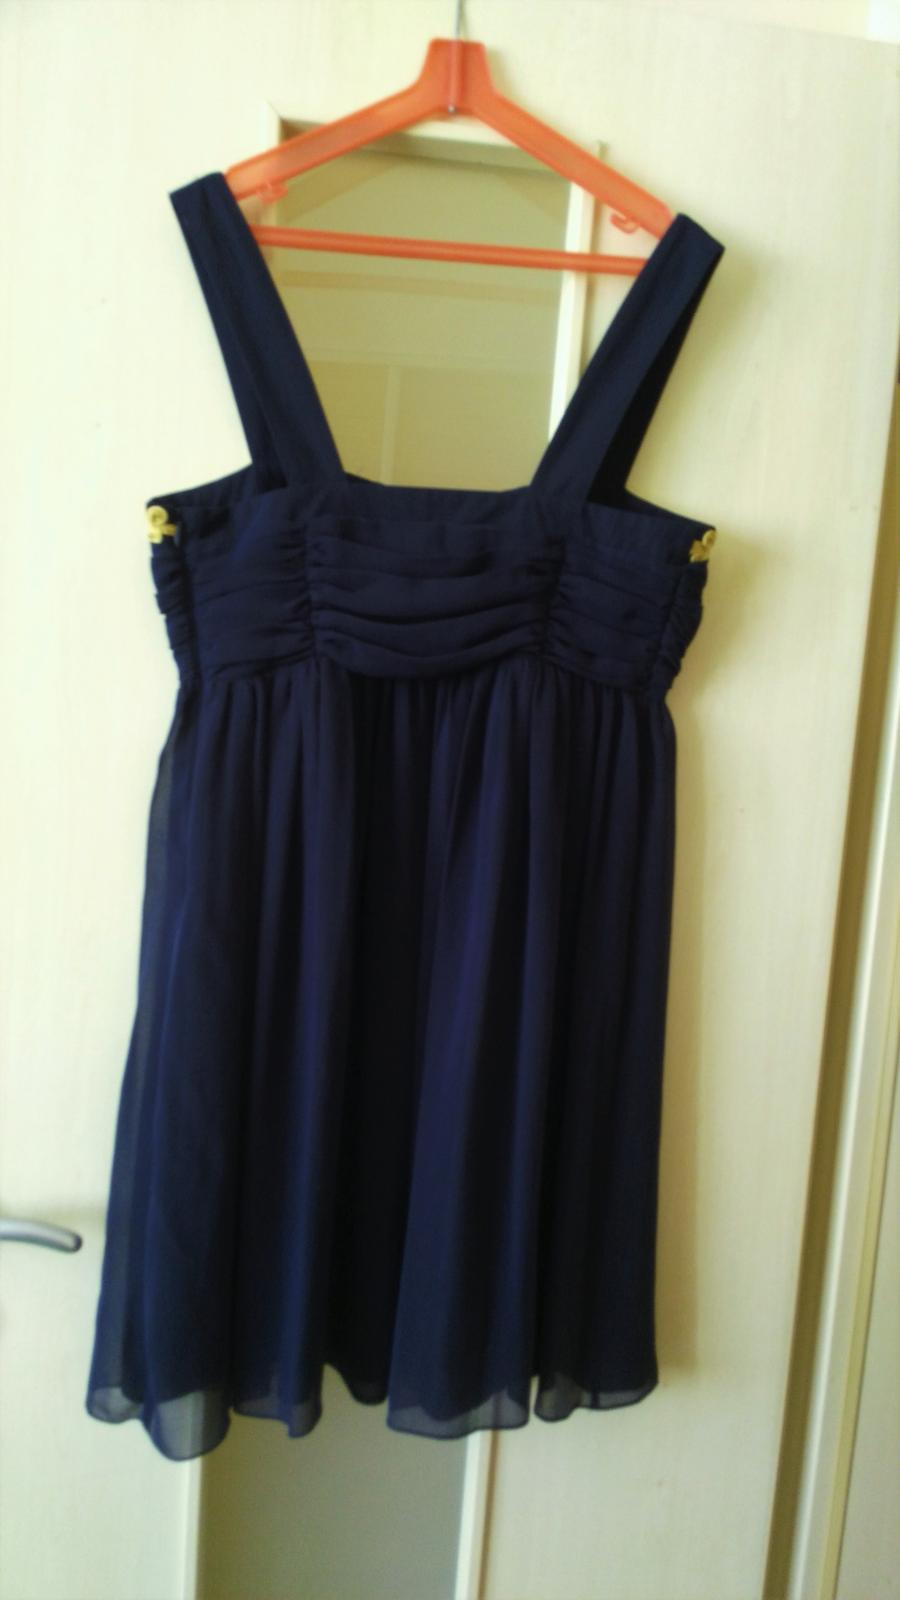 Tmavomodré elegantné šaty č.38 (M) - Obrázok č. 3